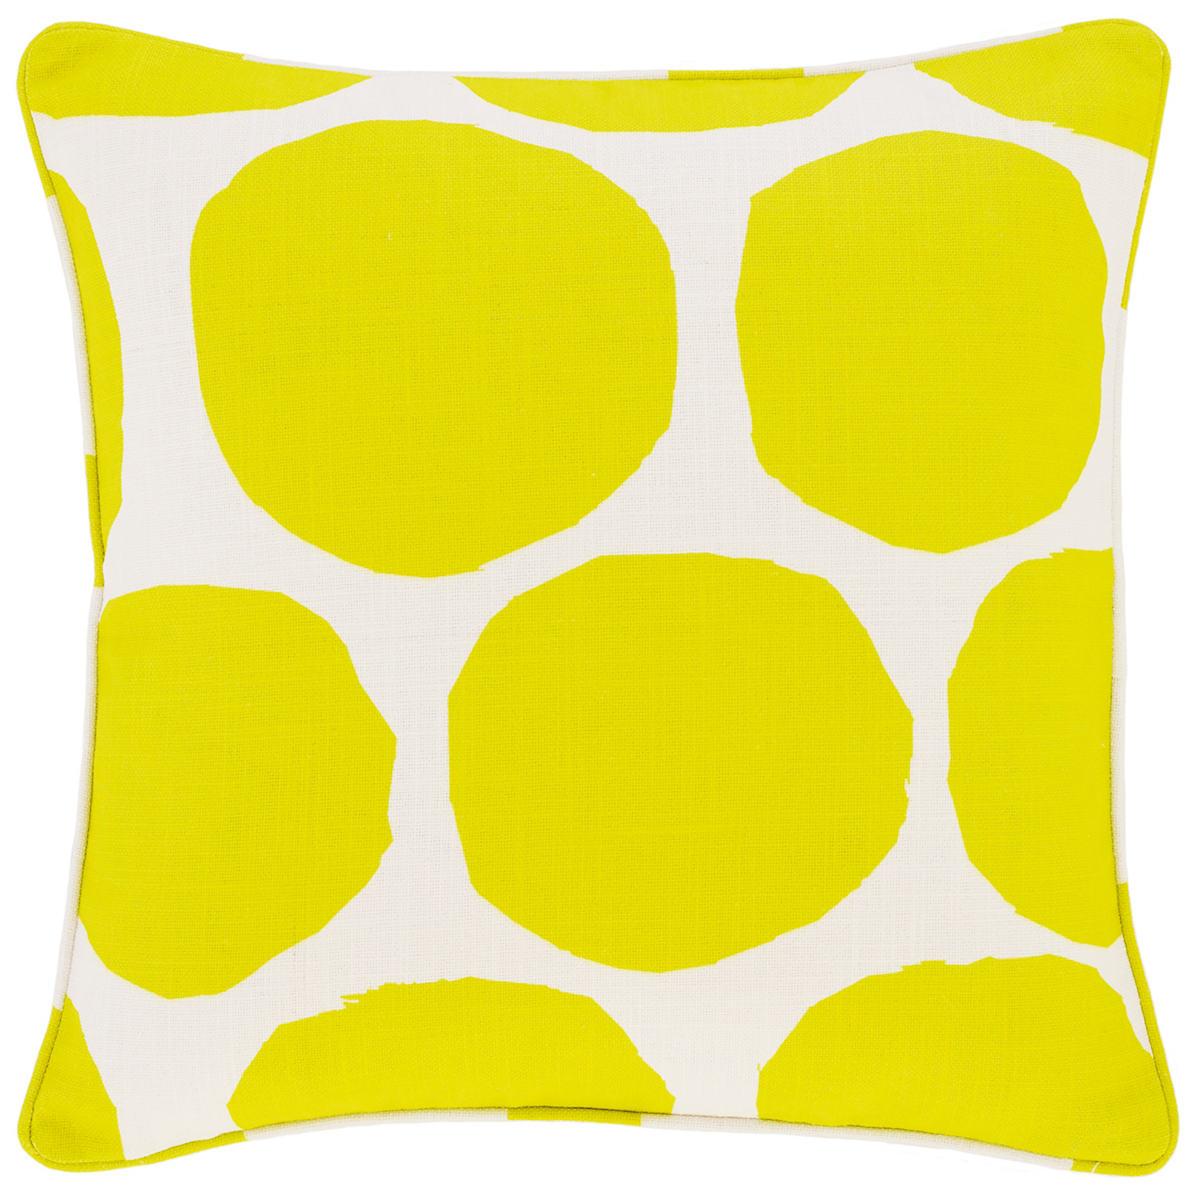 On The Spot Citrus Indoor/Outdoor Decorative Pillow